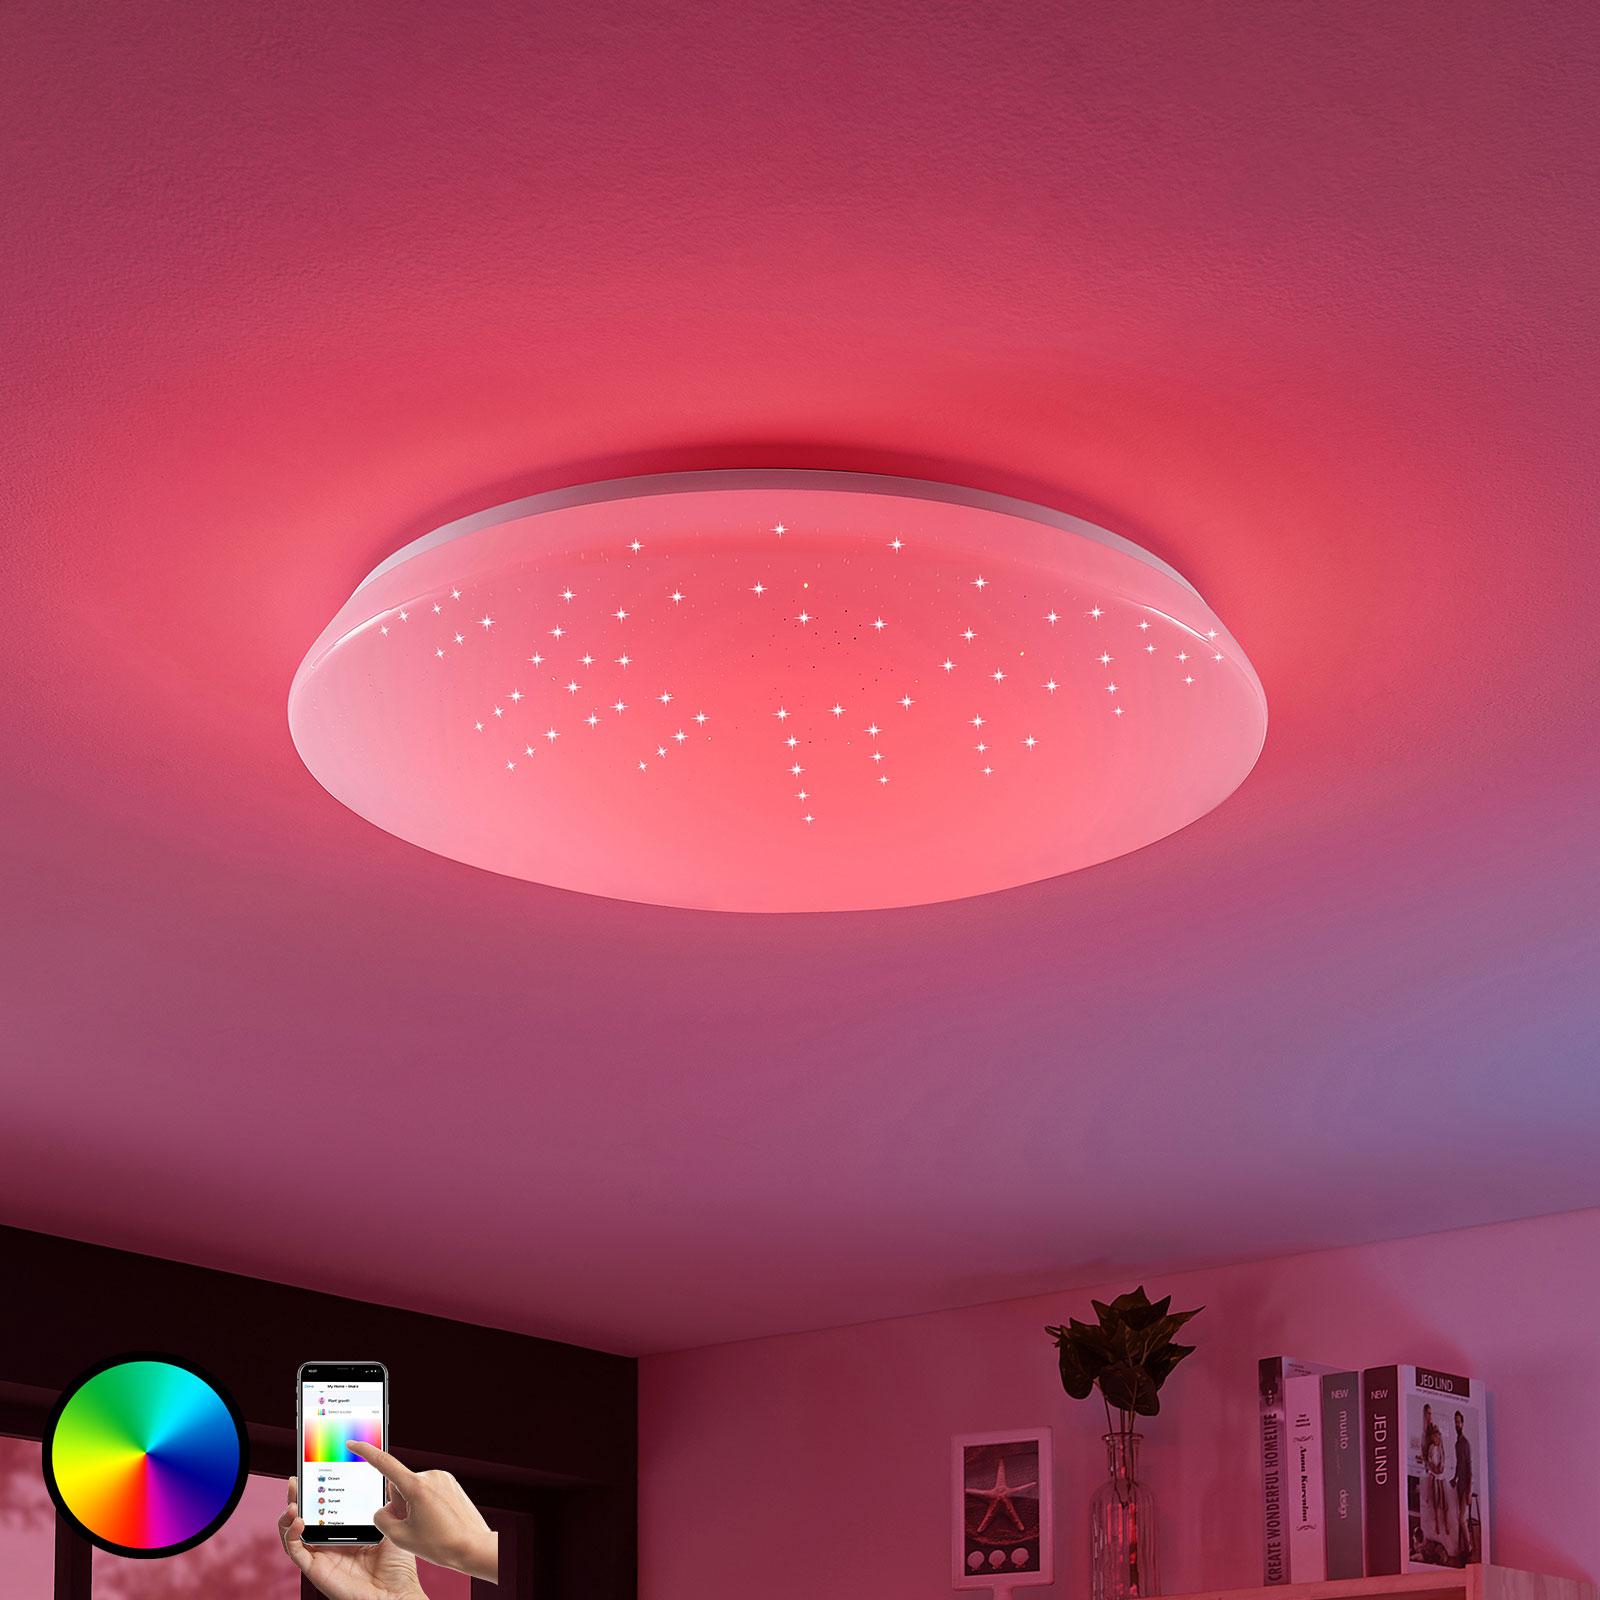 LED-kattolamppu Jelka, WiZ, RGBW -värin vaihto